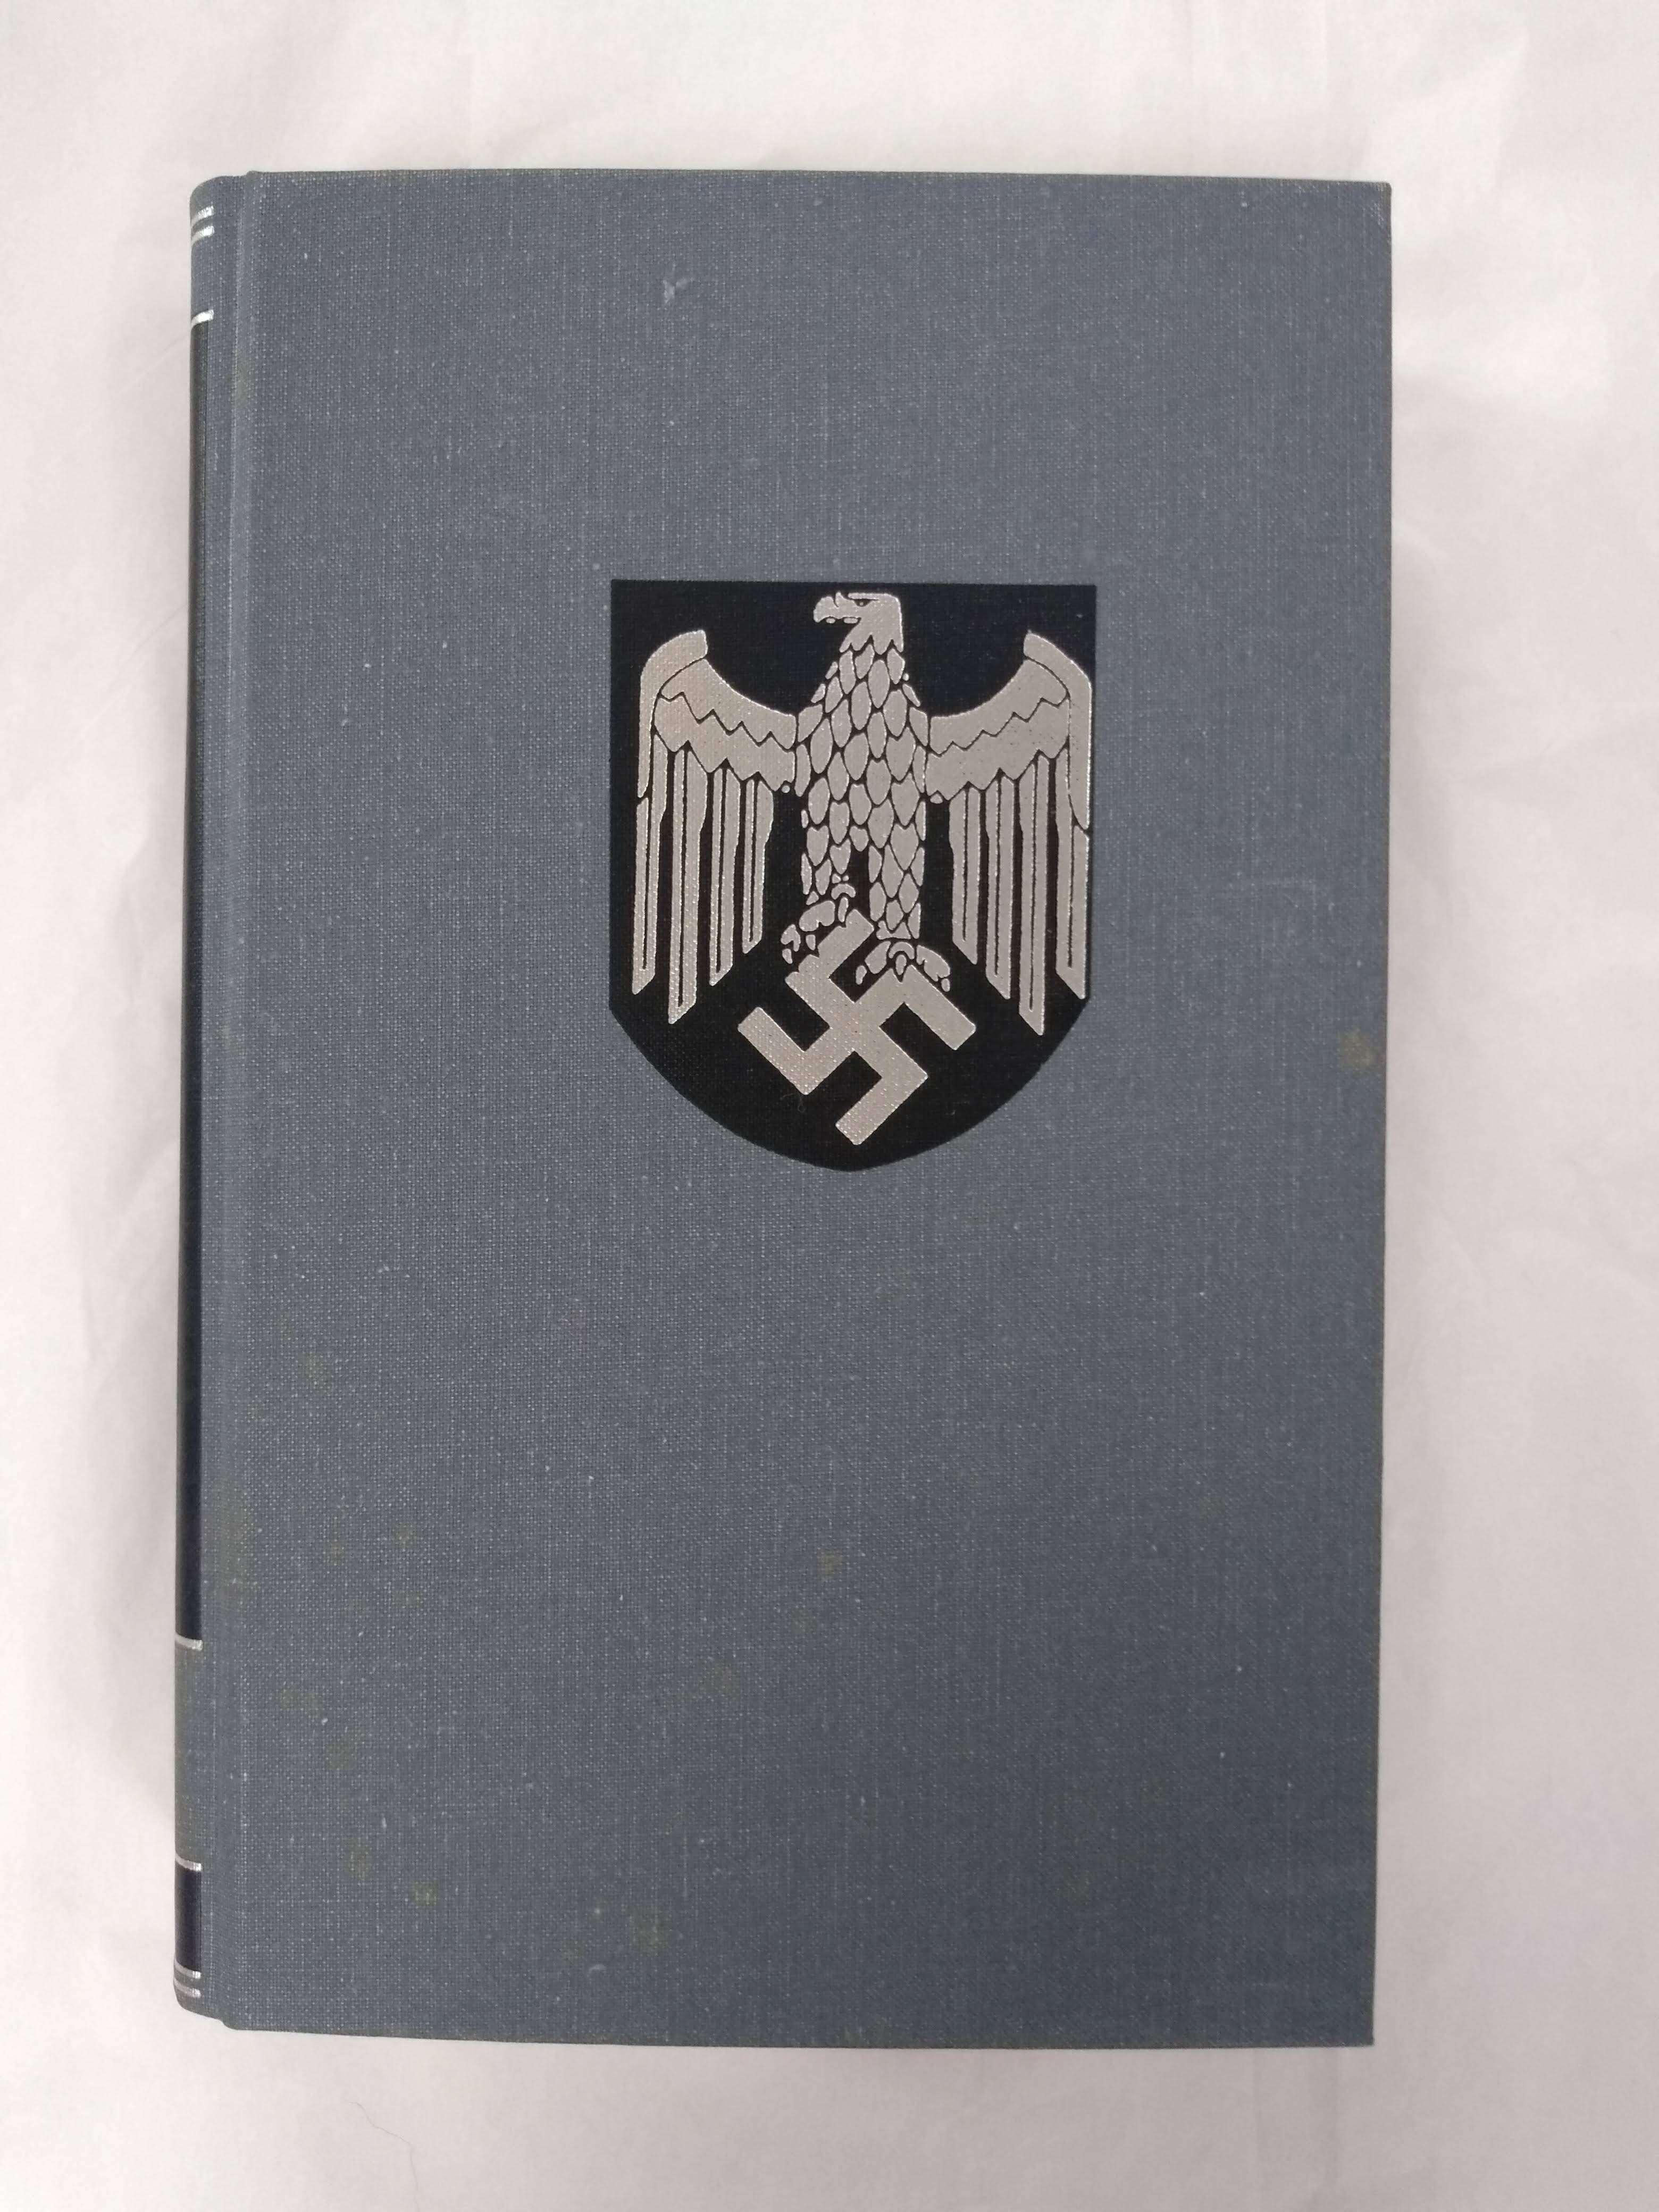 Handbook of the German Army 1940